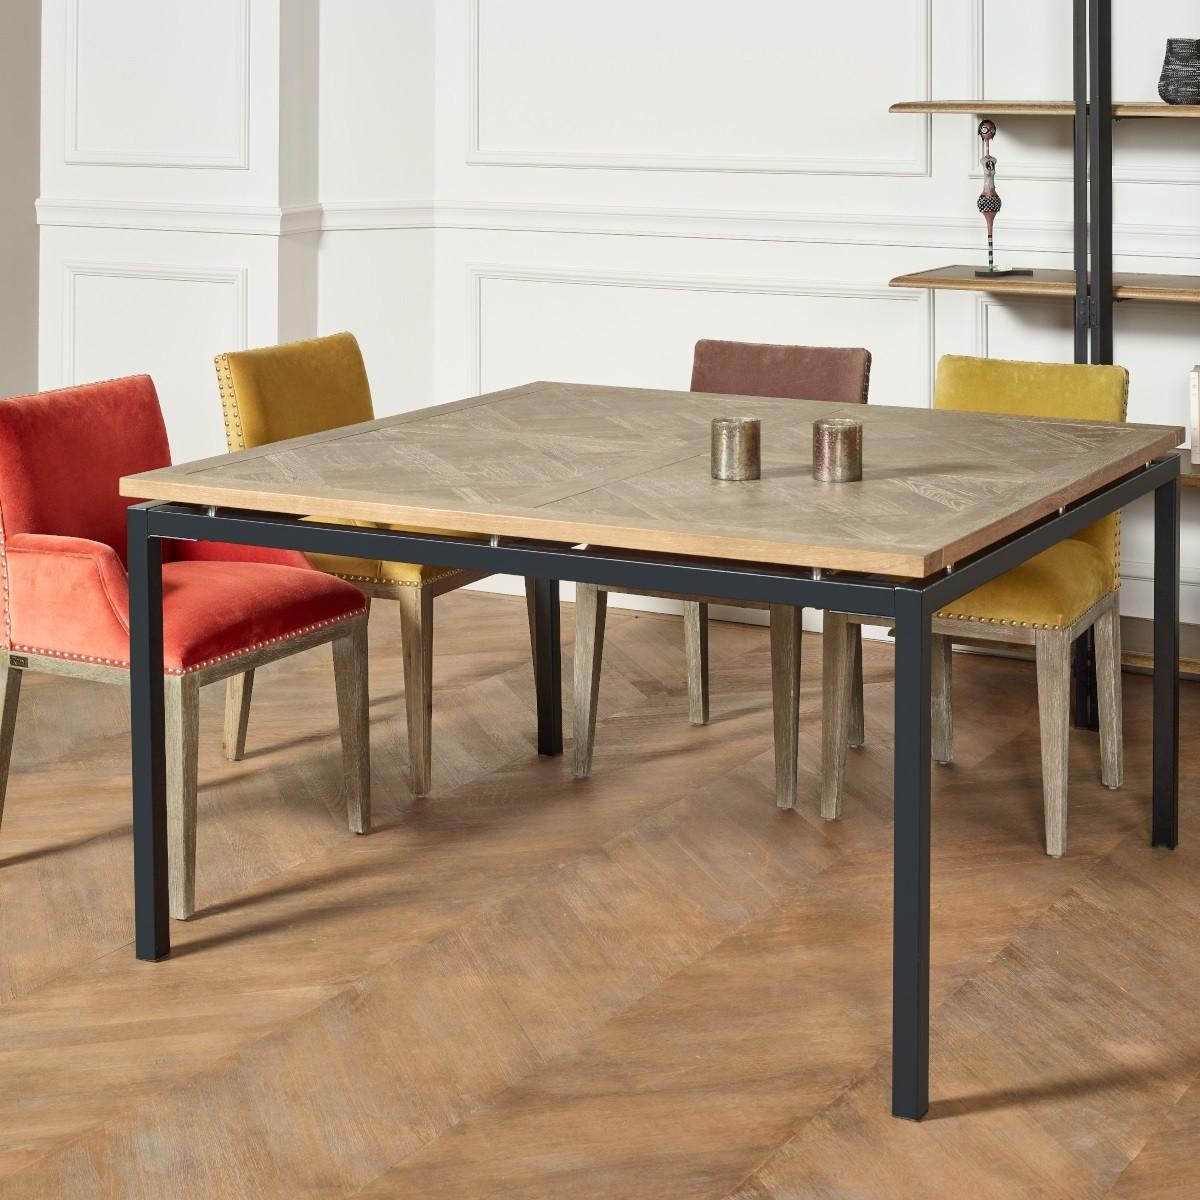 Table A Manger Carree table carrée, chêne massif, pieds métal, zazie